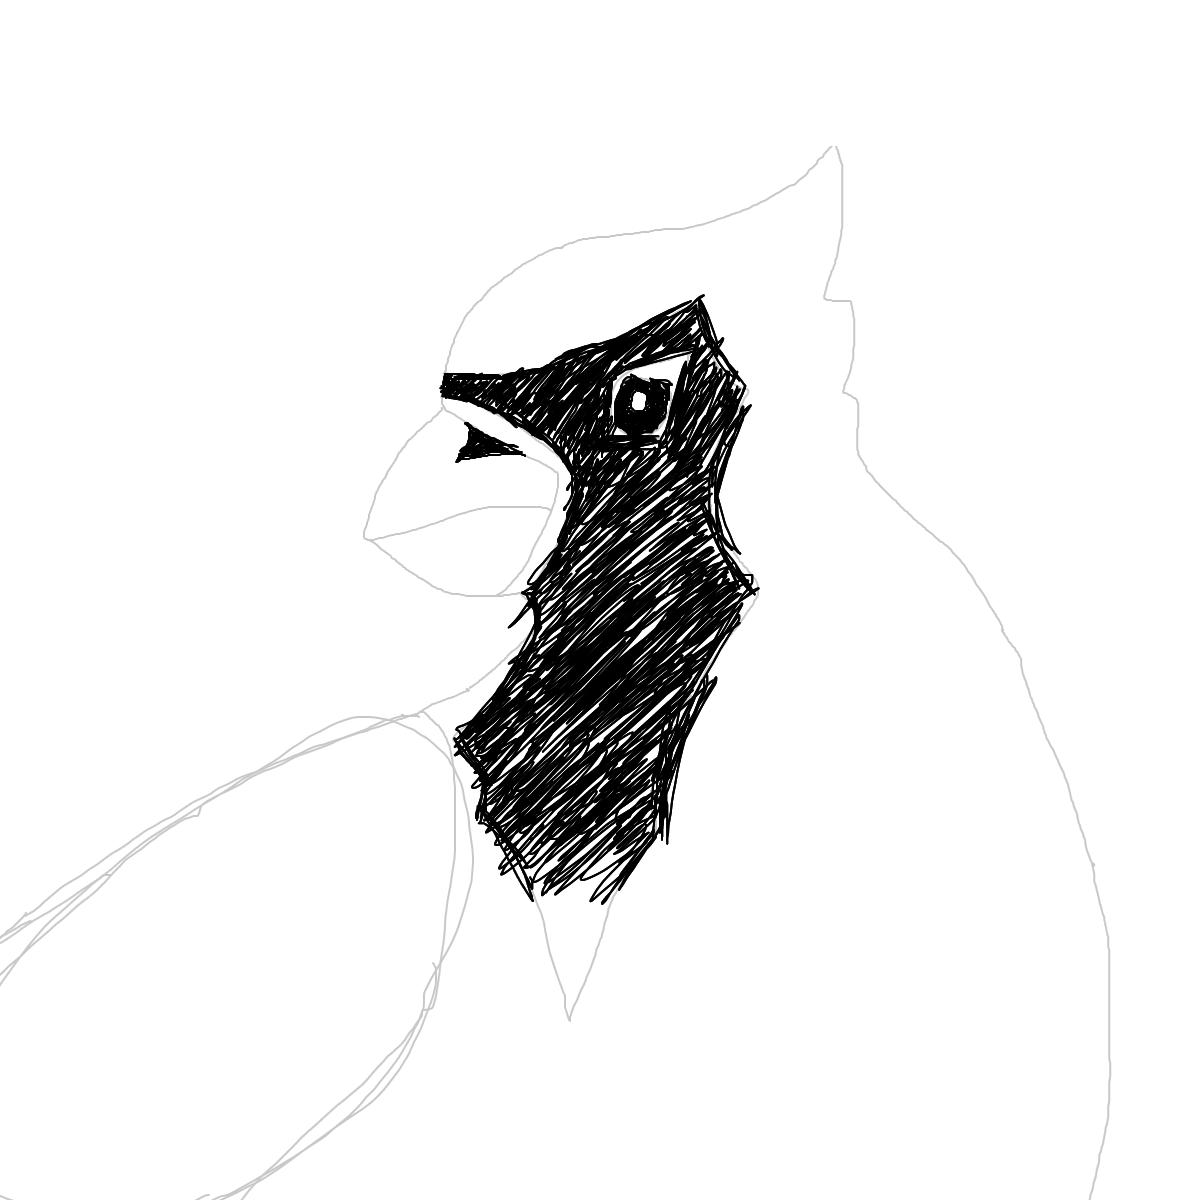 BAAAM drawing#23364 lat:41.9478492736816400lng: -87.6557922363281200